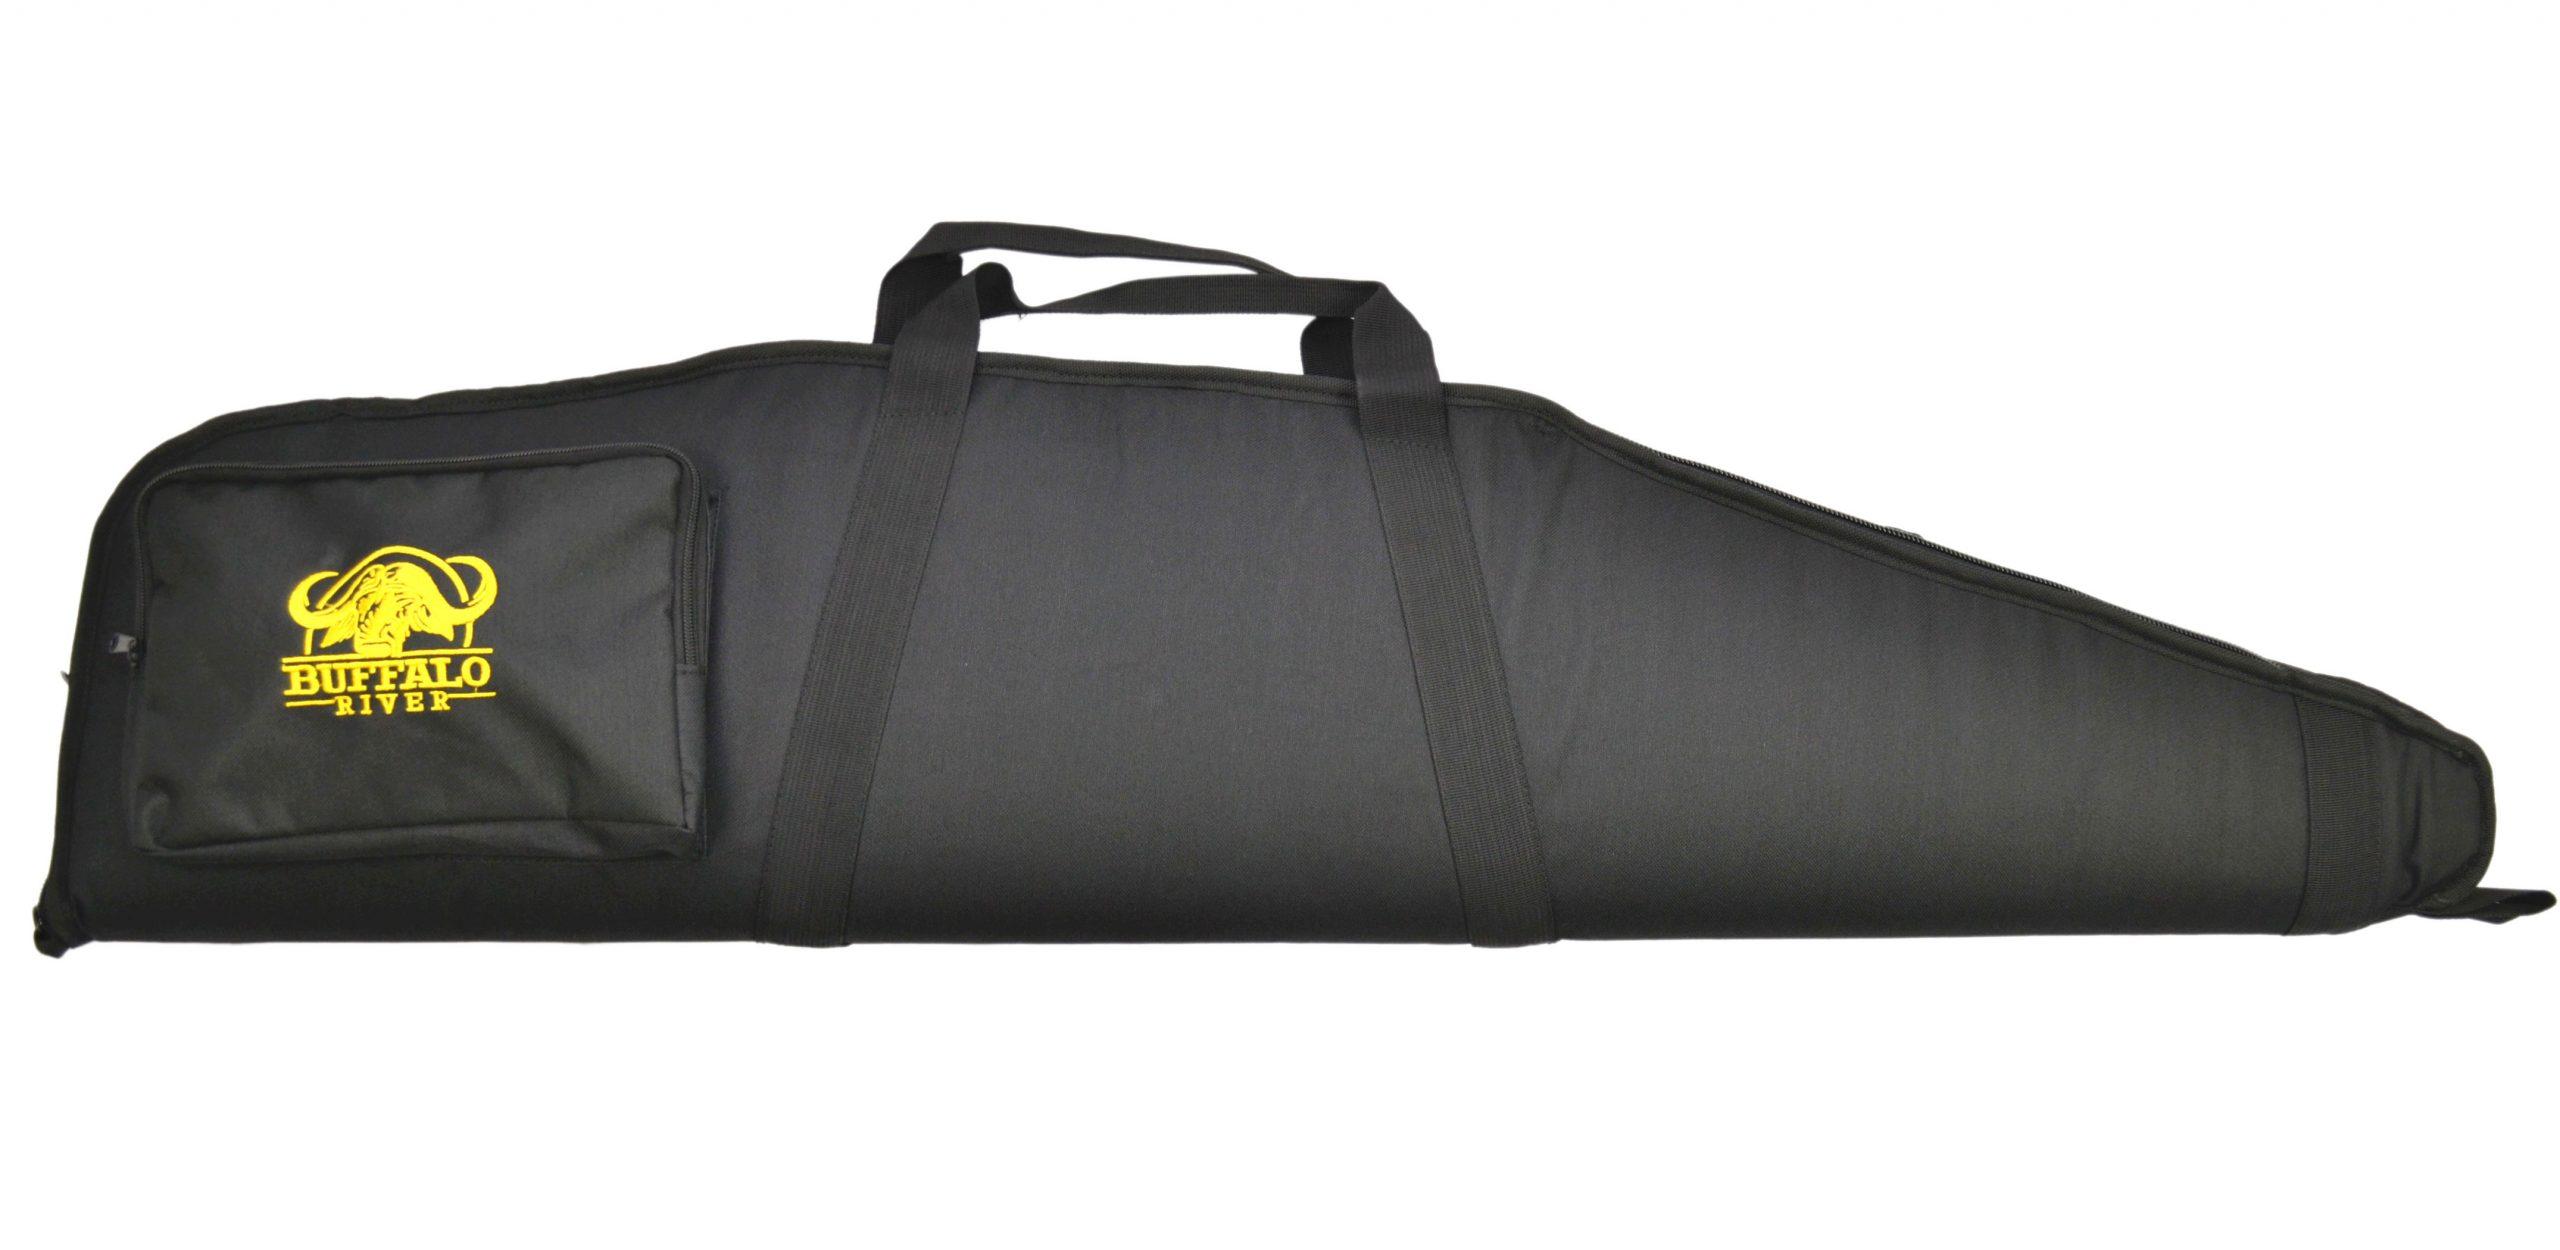 Funda Buffalo-River modeo DELUXE 132cm negro